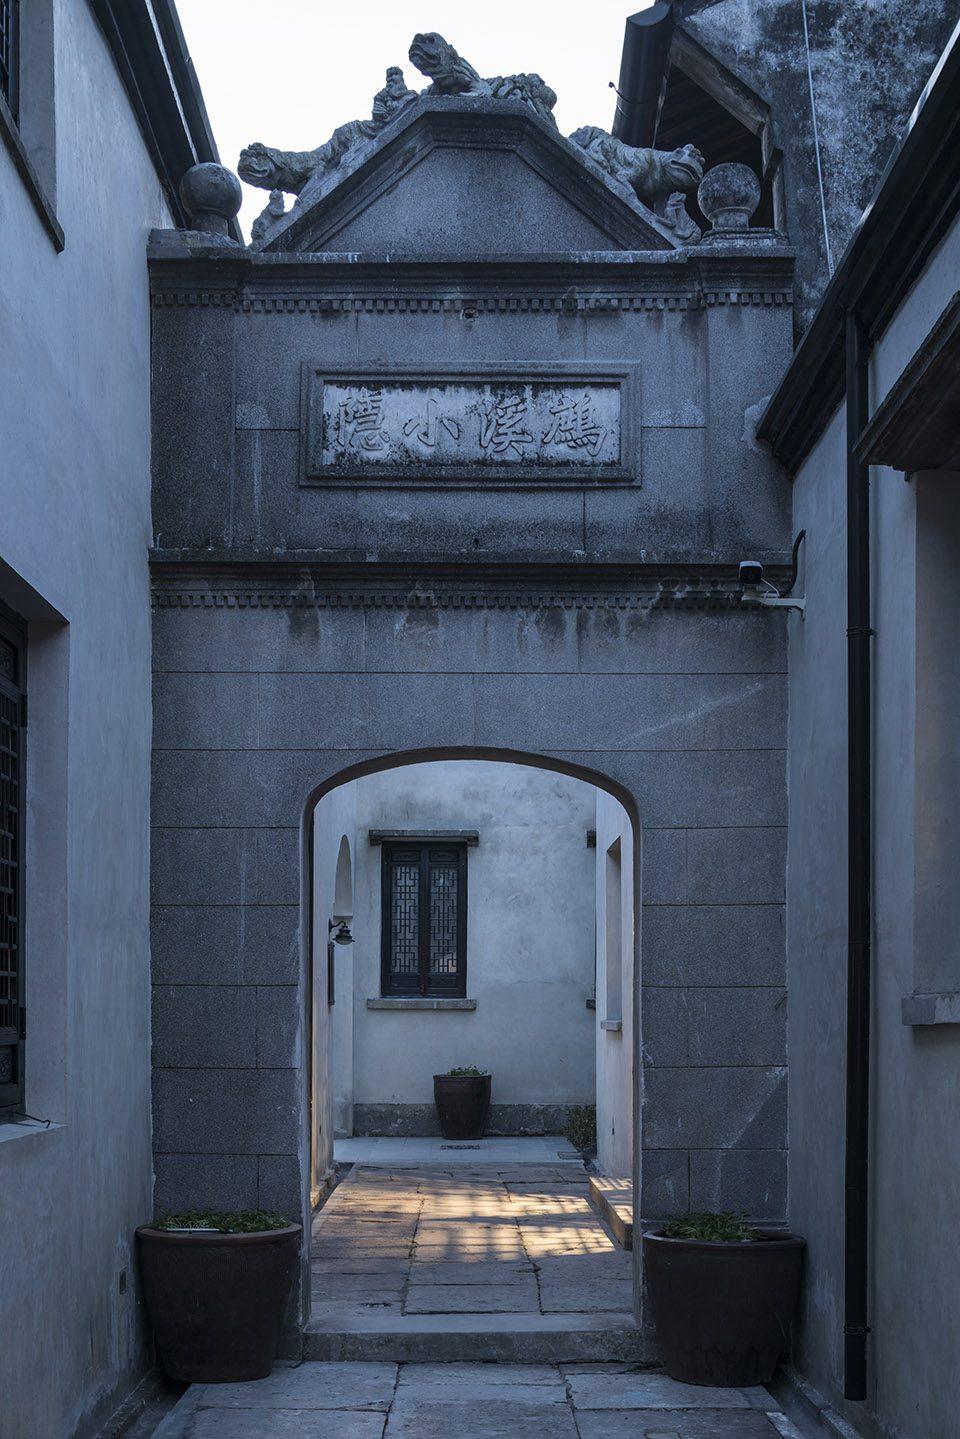 019-Nanxun-Blossom-Hill-Boutique-Hotel-Qiu-Shu-Li-By-Dariel-Studio-960x1439